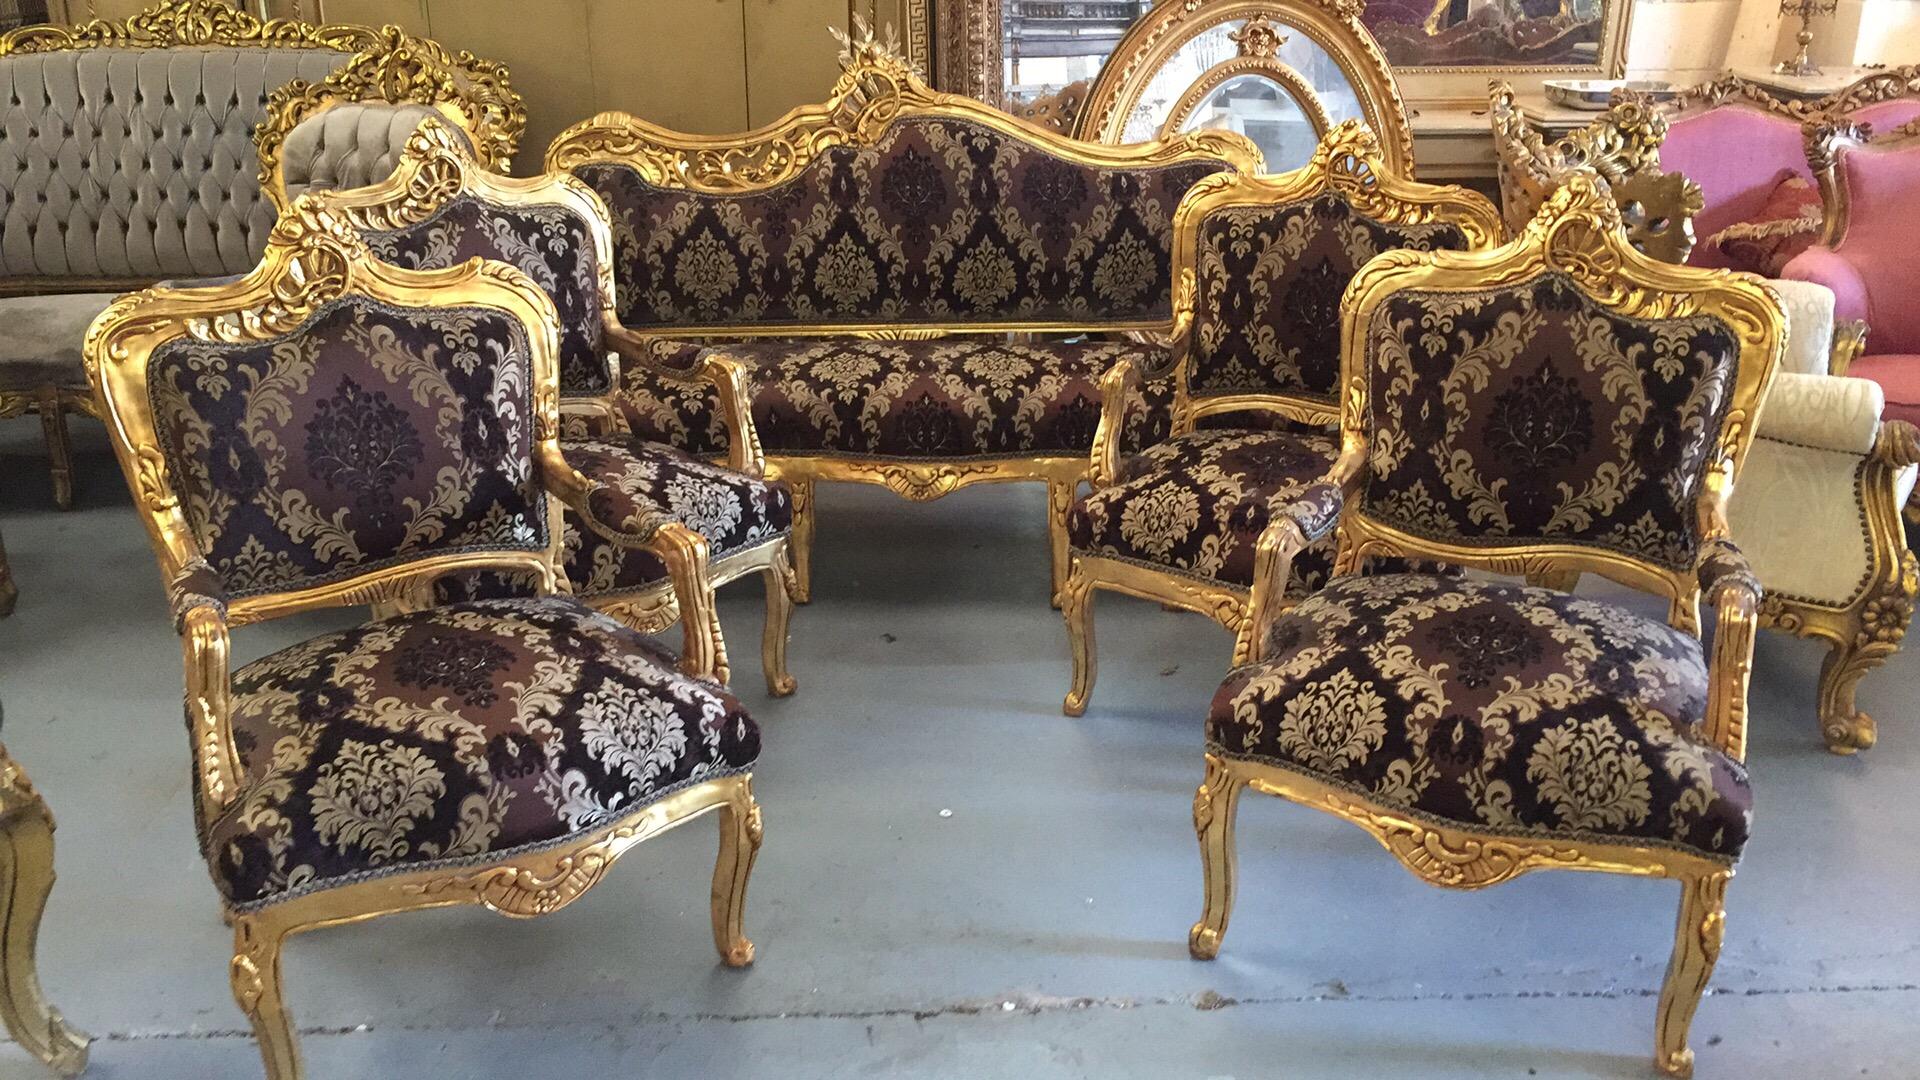 Renaissance+Antique+Furniture+and+Lighting+Warehouse+Dublin+Ireland+salon+antiques.jpeg